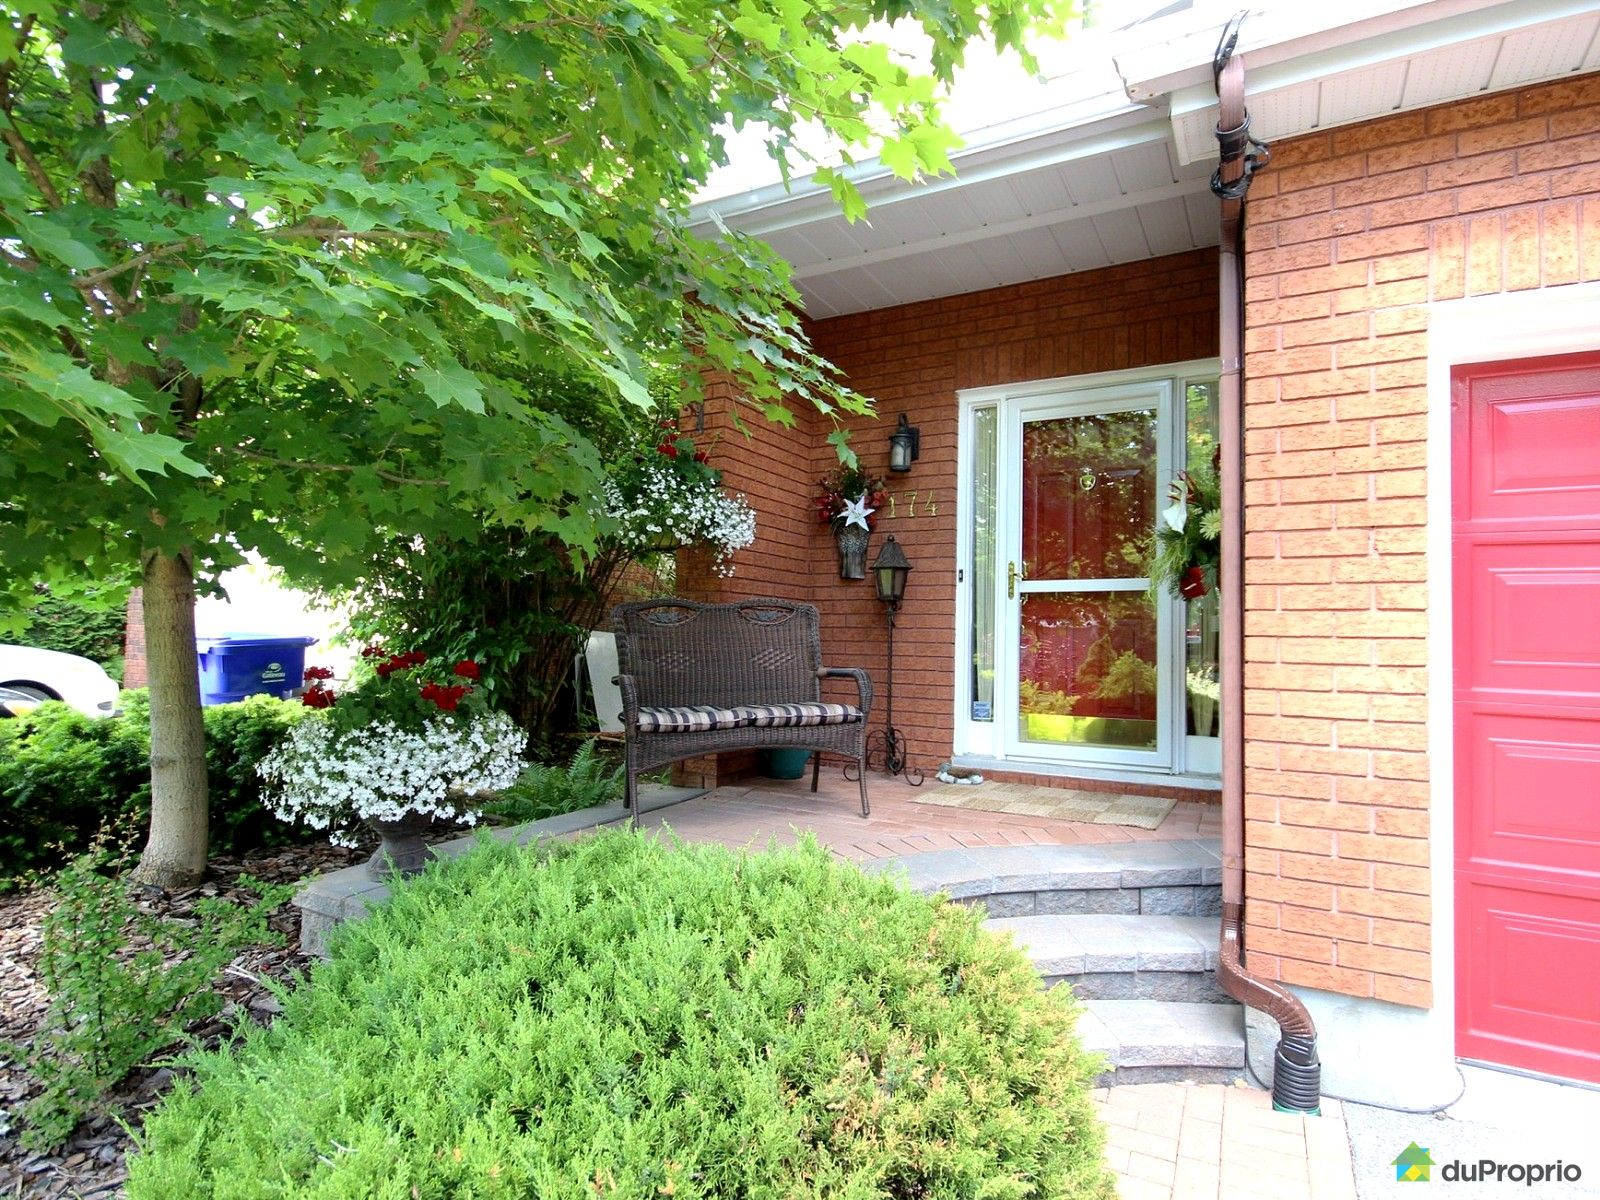 Maison vendu Gatineau, immobilier Québec  DuProprio  524261